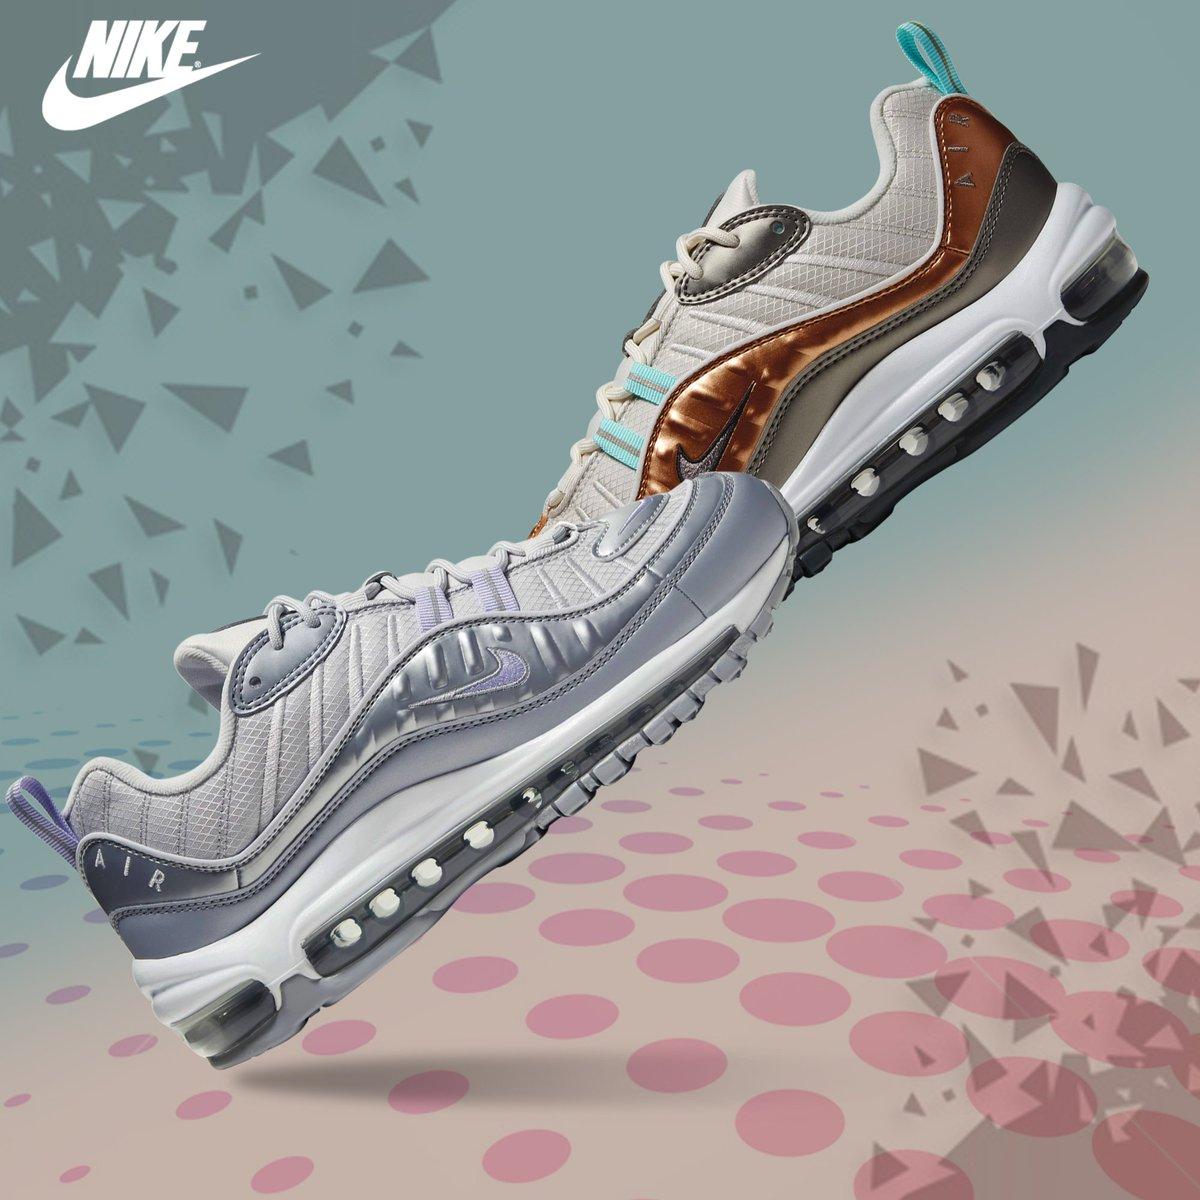 Nike Air Max 98 Grey Silver Where To Buy BV6536 001